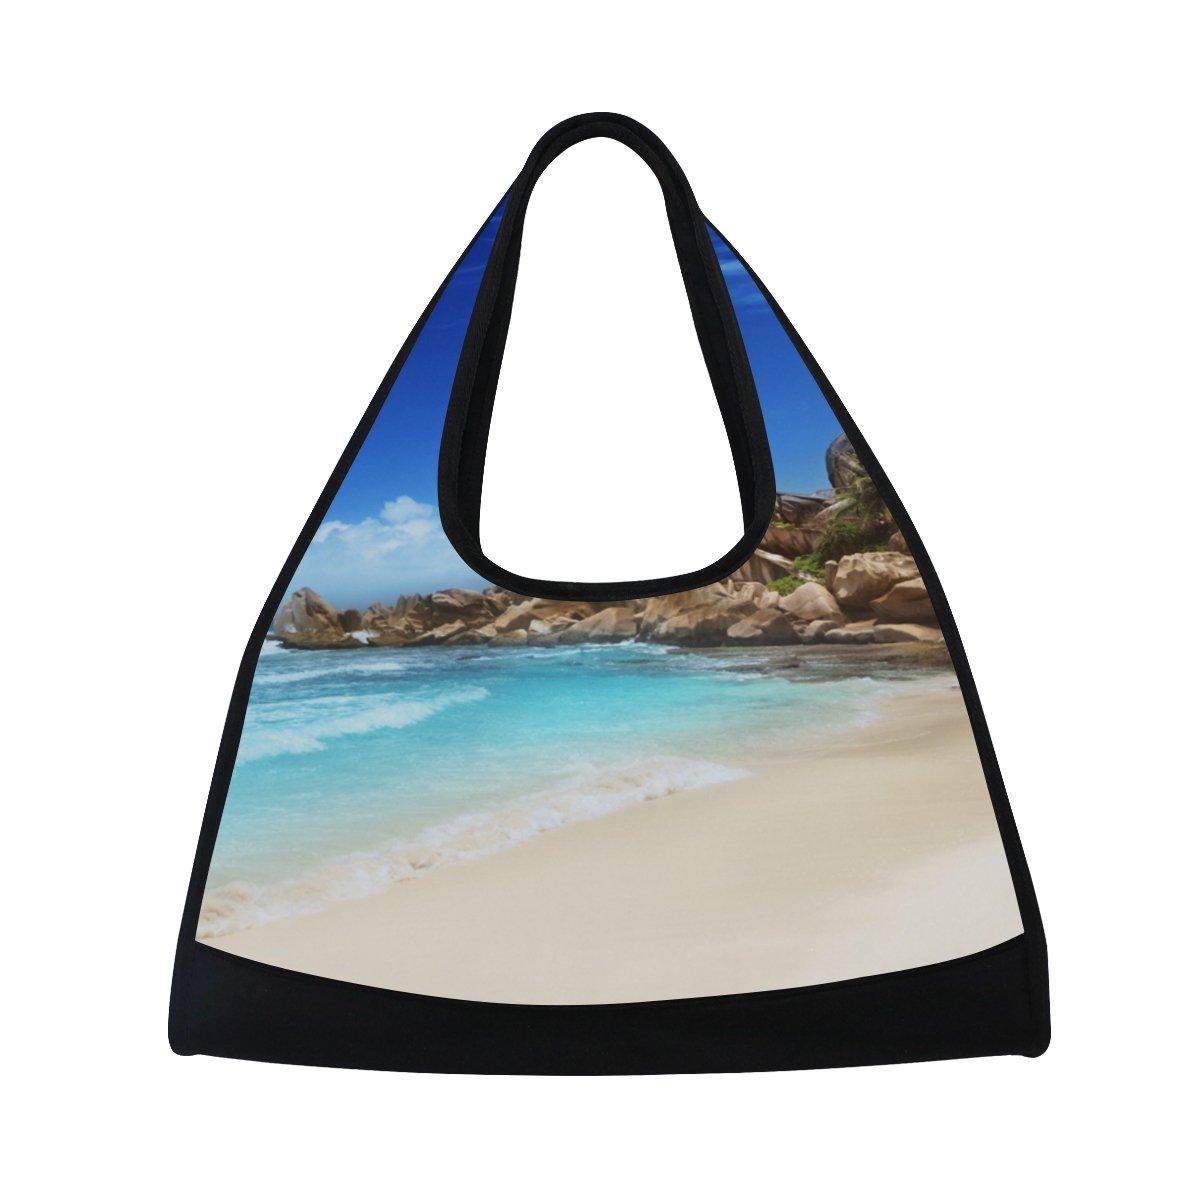 AHOMY Canvas Sports Gym Bag Beach White Cloud And Blue Sky Travel Shoulder Bag